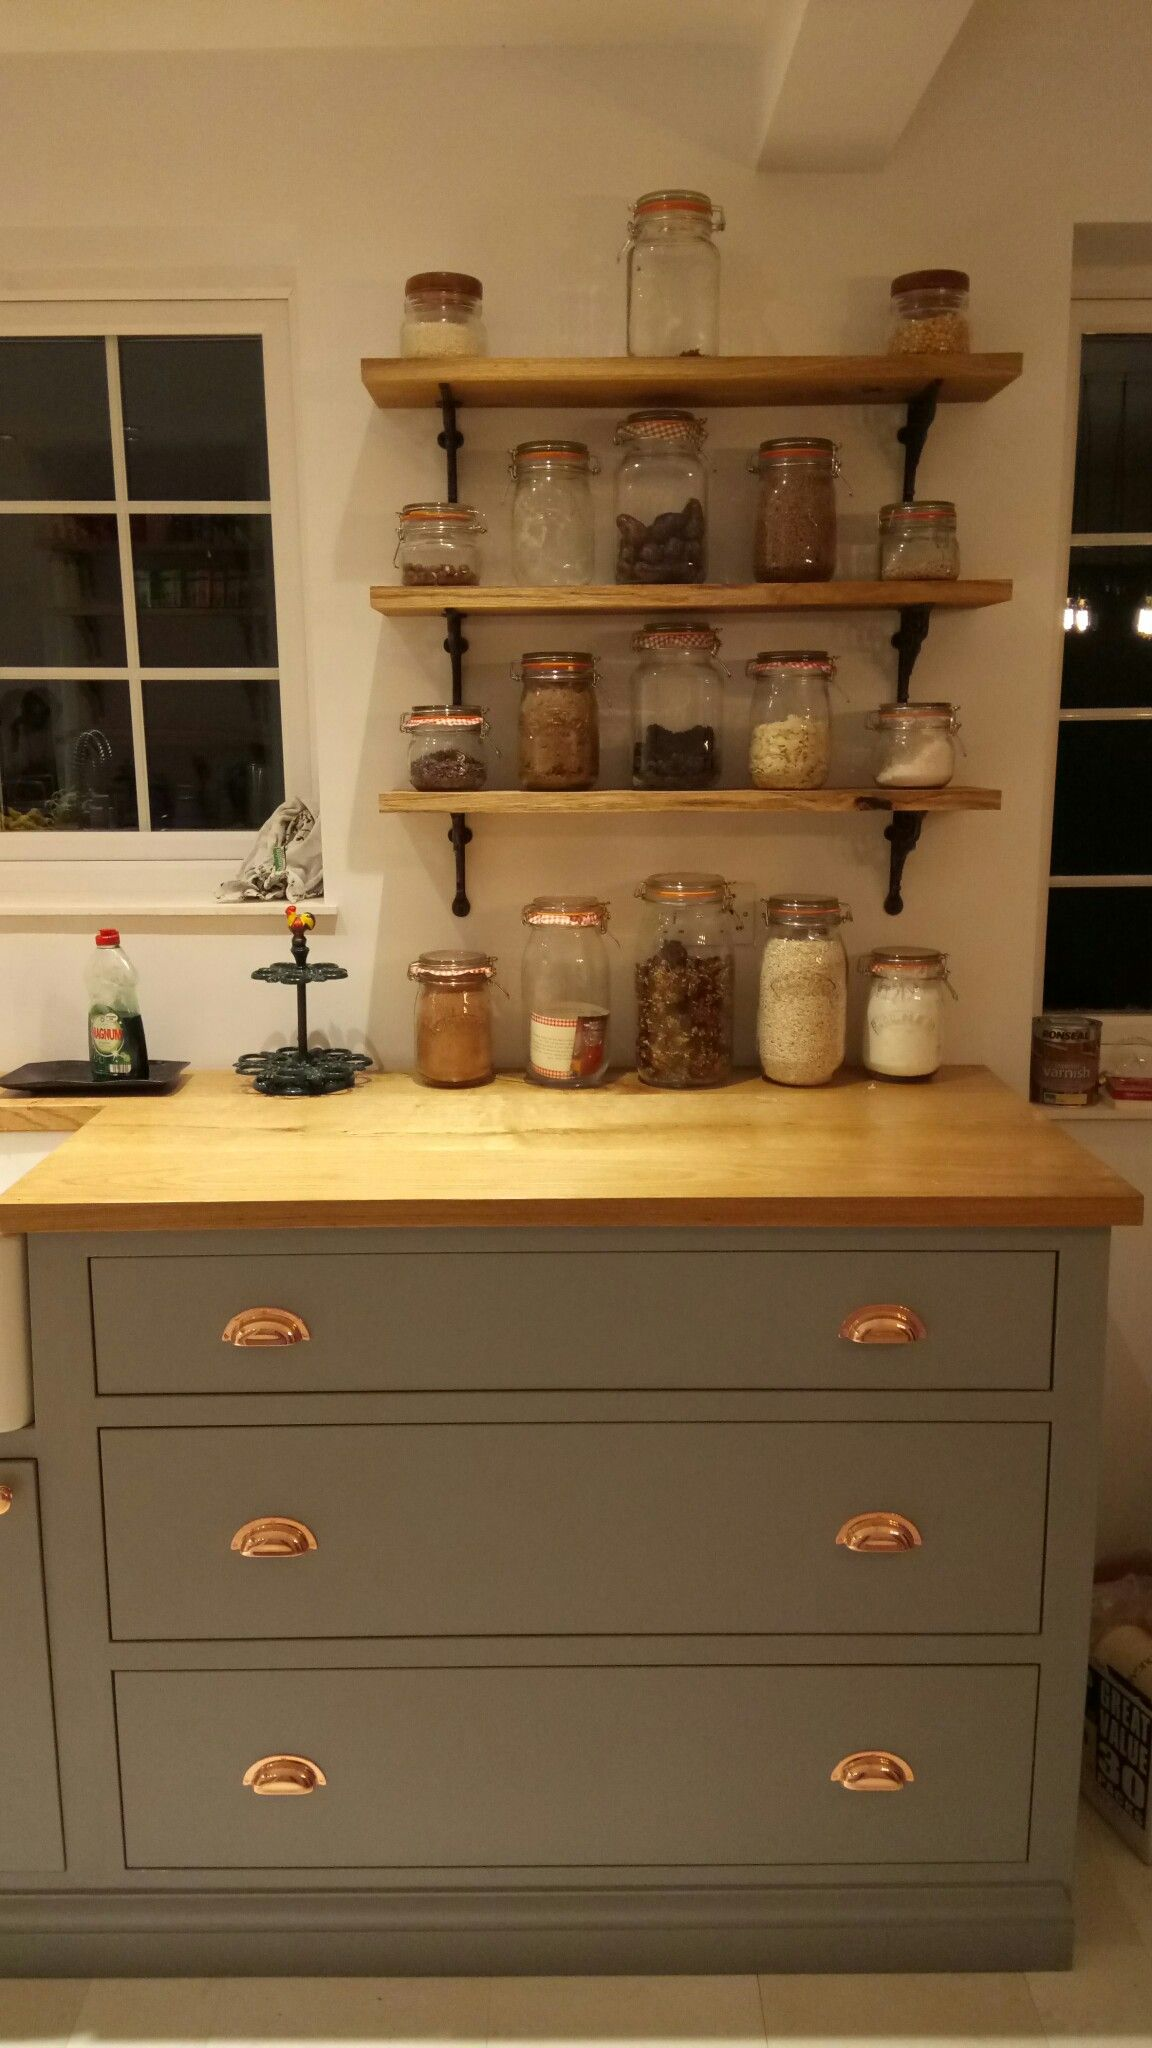 Custom built kitchen grey copper oak shelves rustic kilner jars